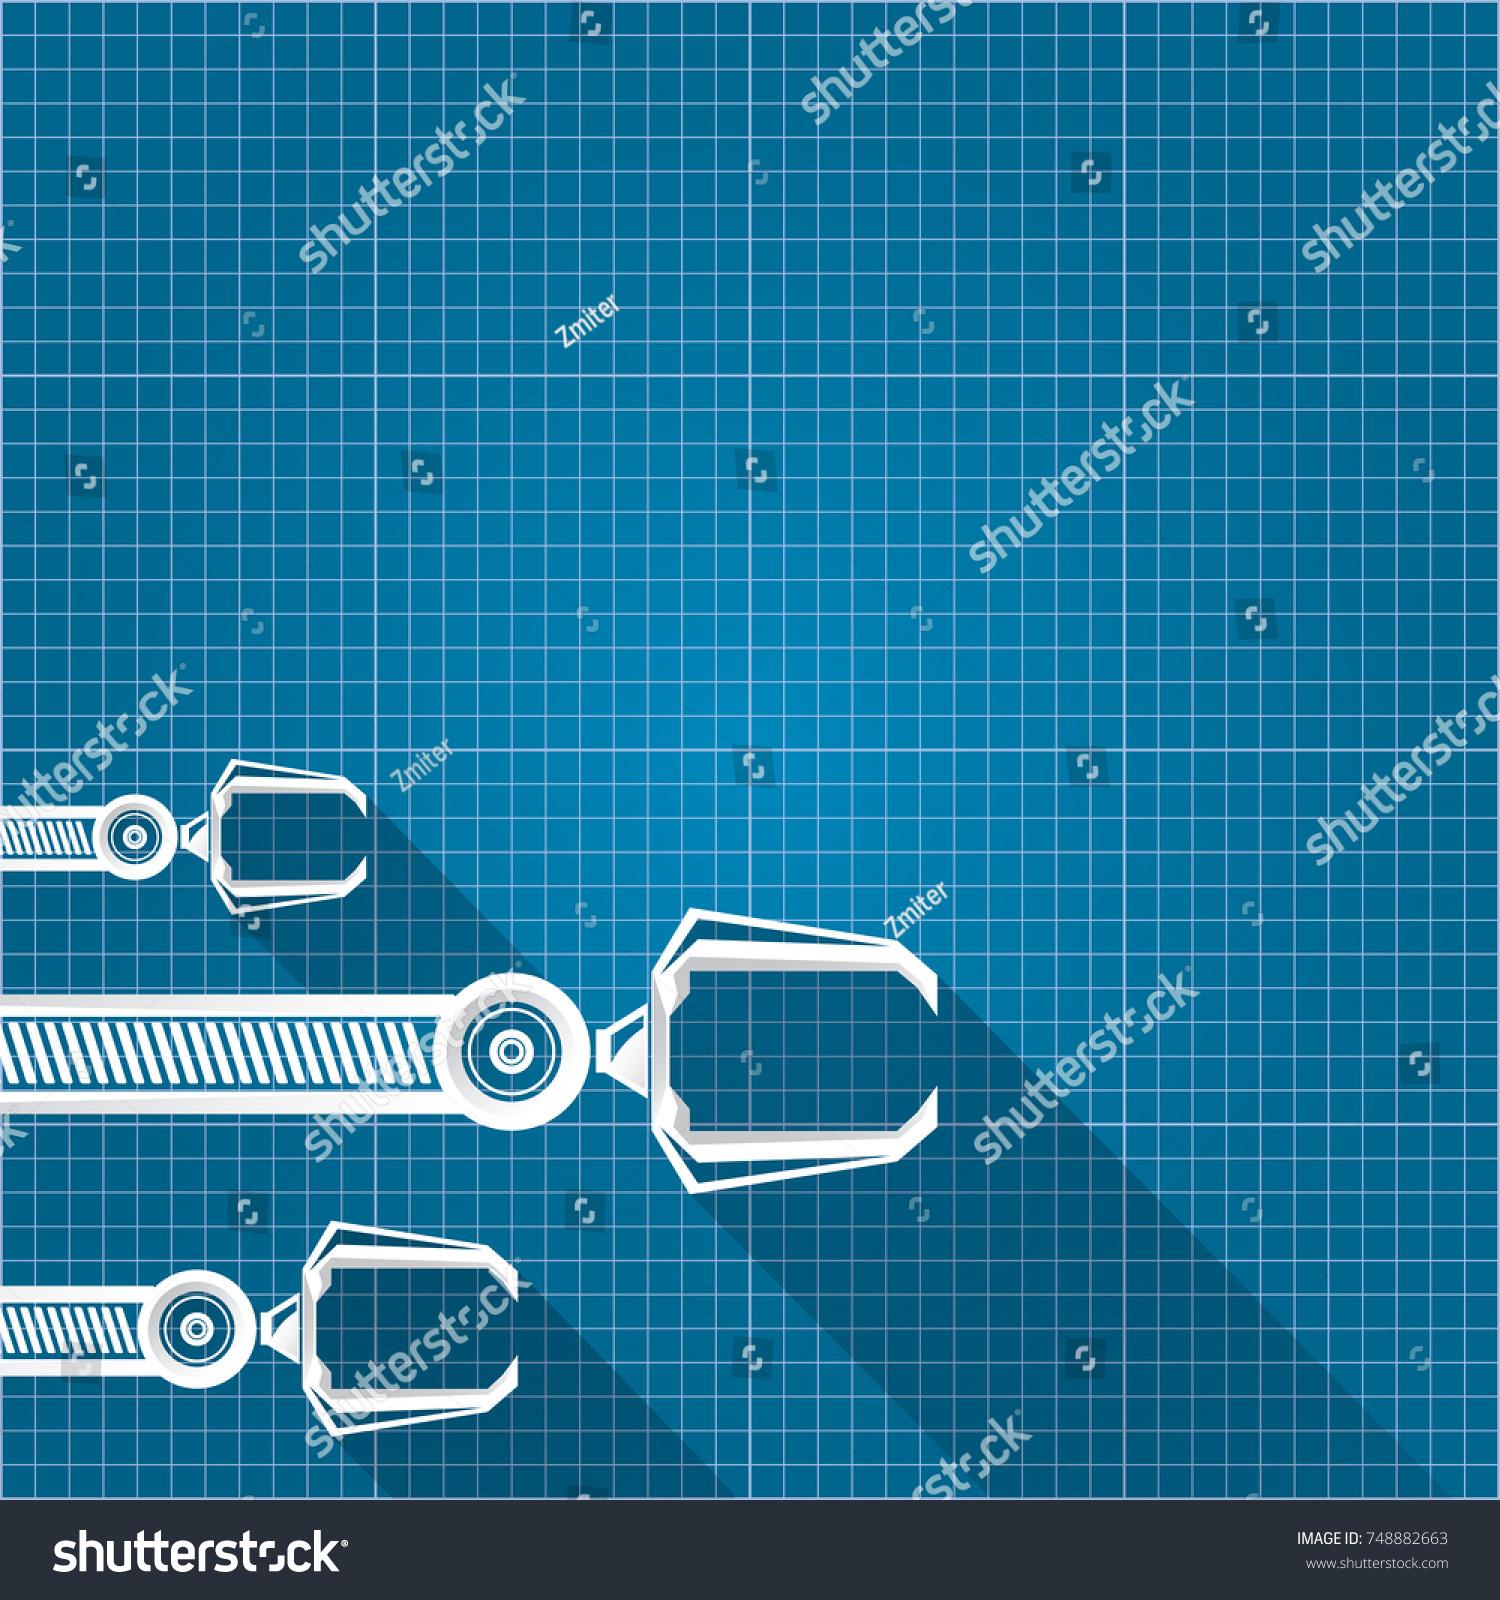 Vector robotic arm symbol on blueprint stock vector 748882663 vector robotic arm symbol on blueprint paper background robot hand technology background design template malvernweather Images